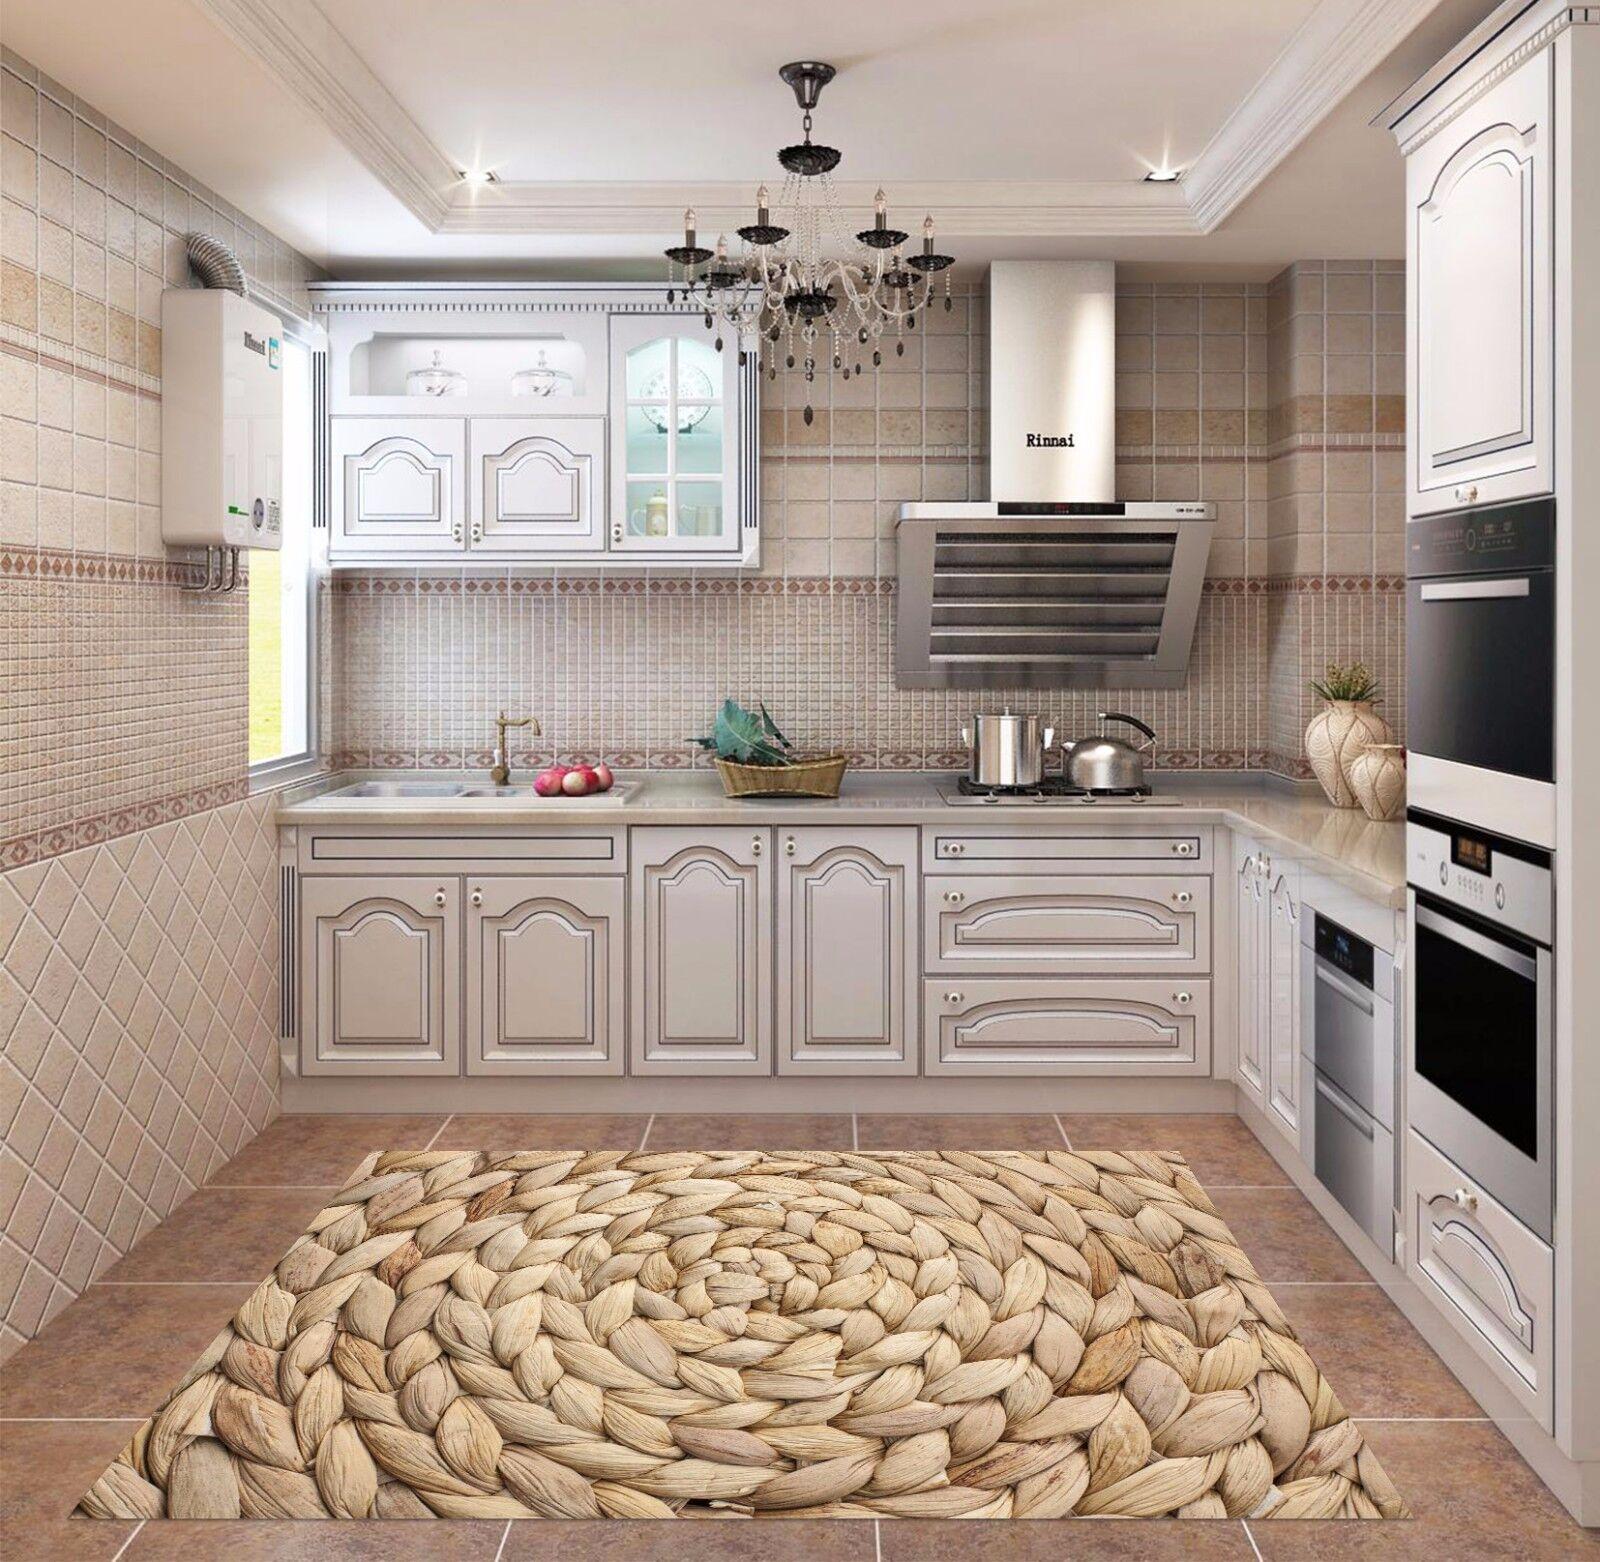 3D Knitting Rope 8 Küchenmatte Bodenbilder Wand Drucken Wand AJ WALLAPER AU Kyra